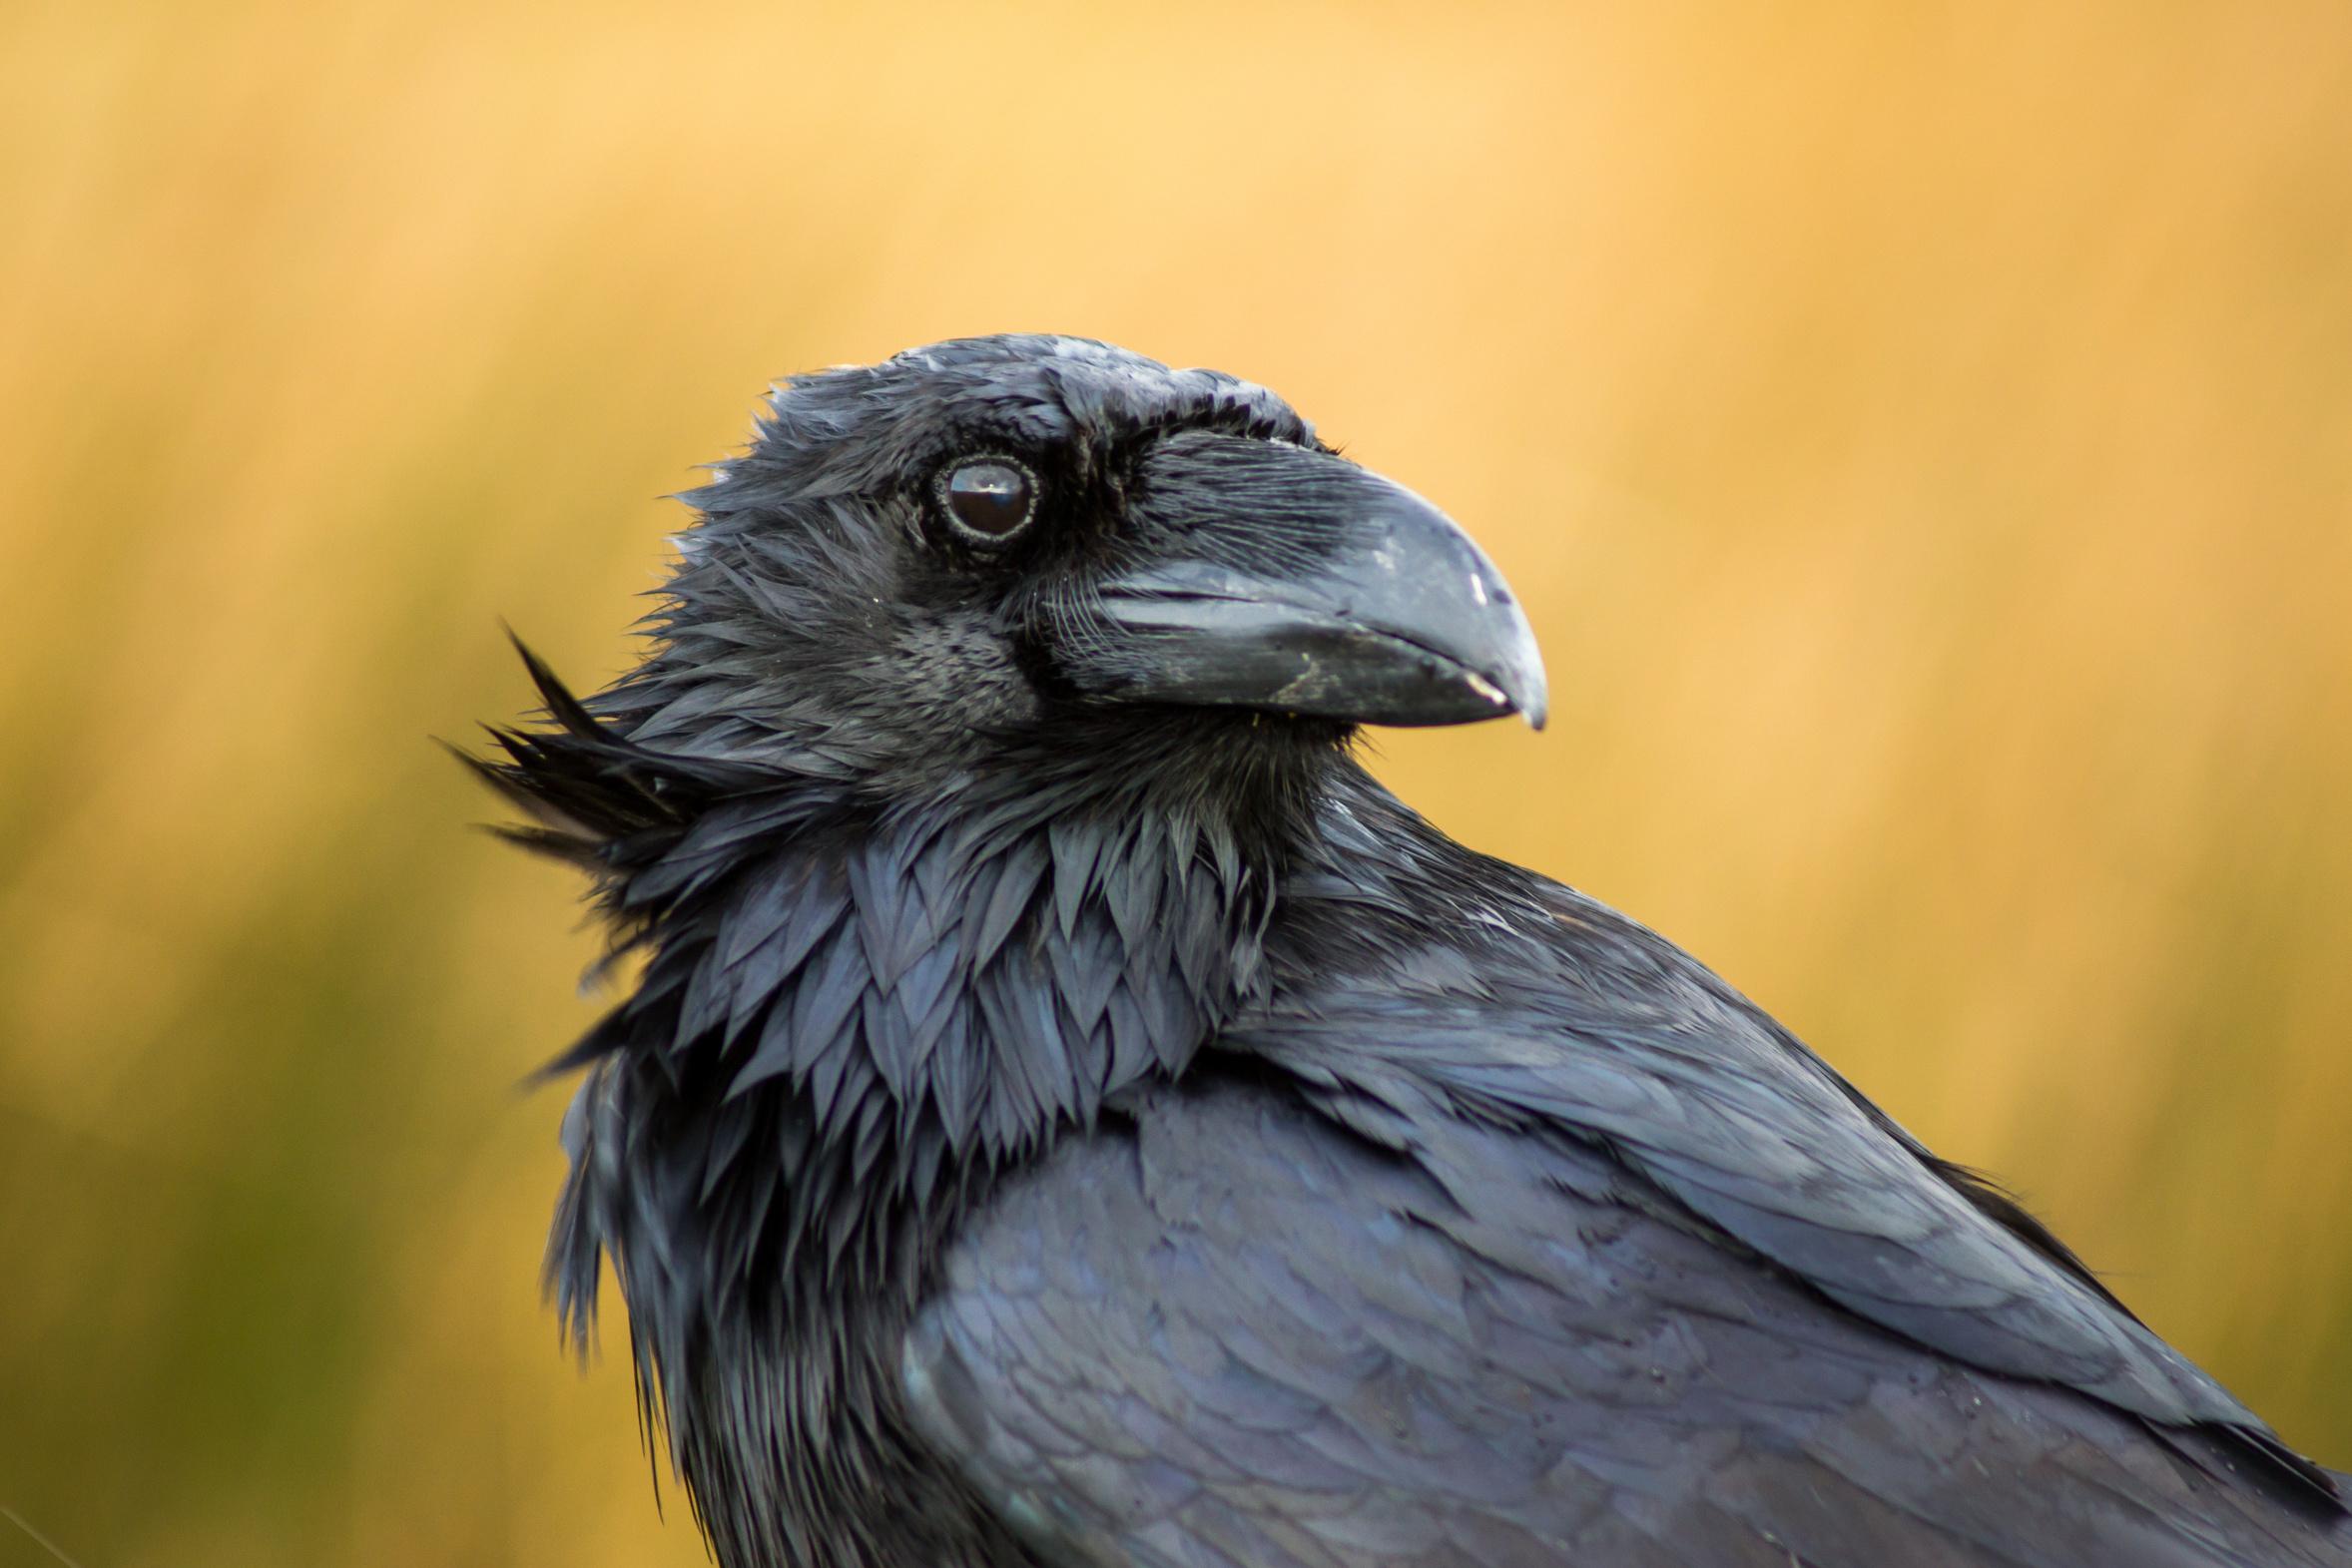 Orange Raven Startrabe